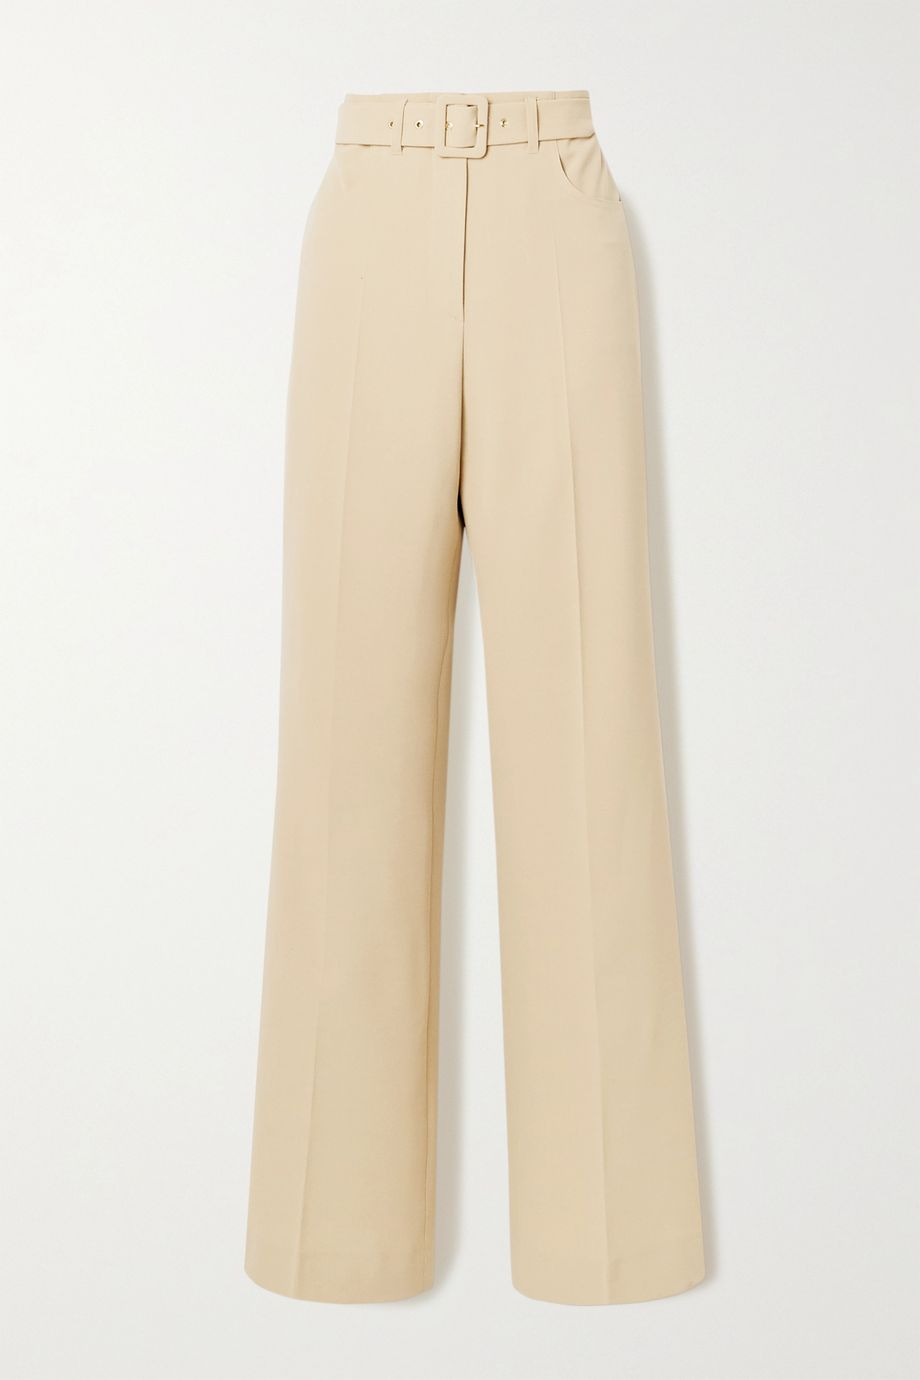 Nanushka Clara belted woven wide-leg pants